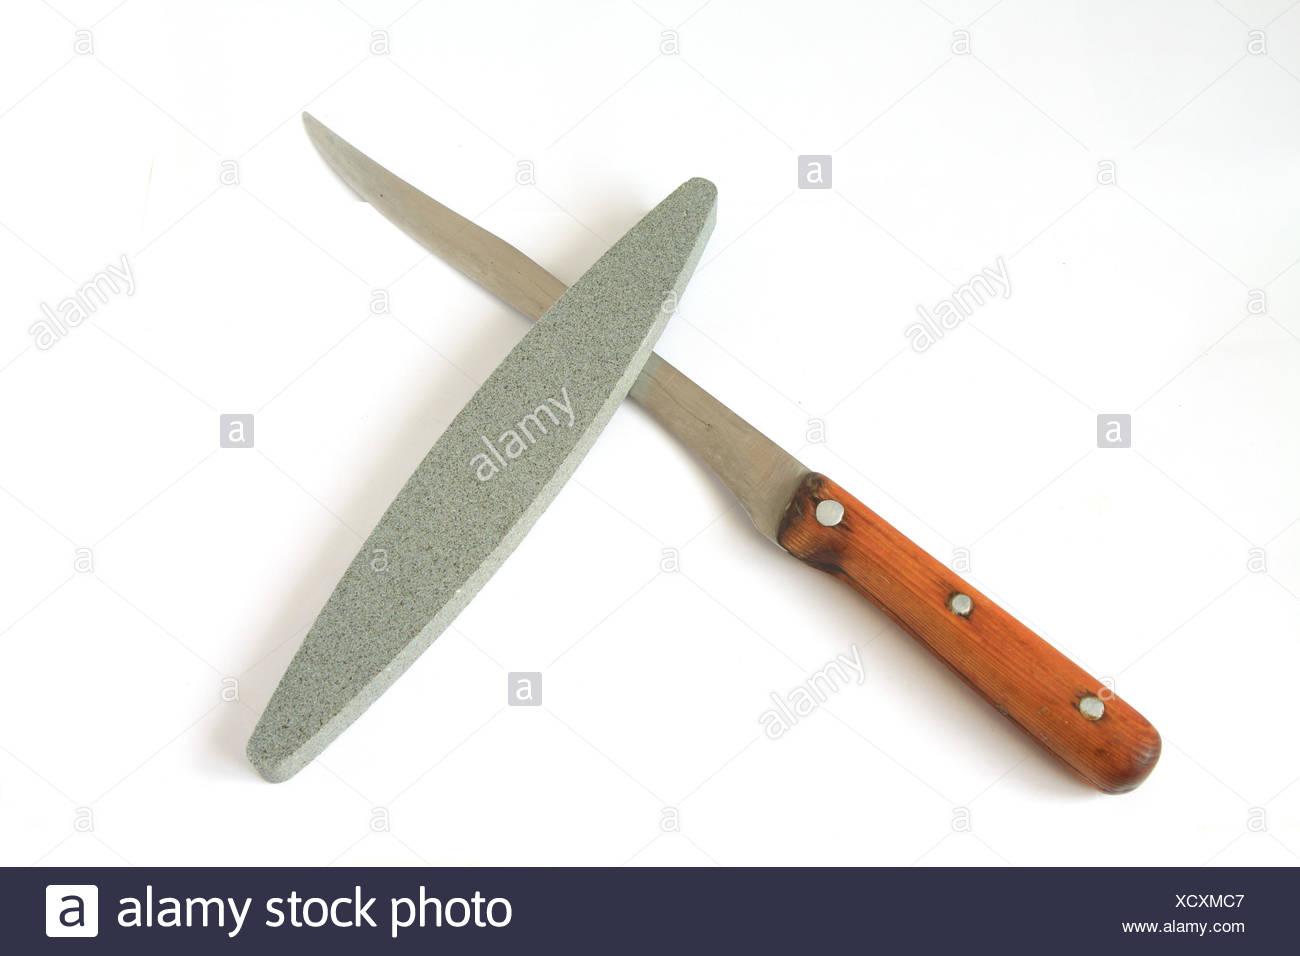 knife and emery on white background - Stock Image